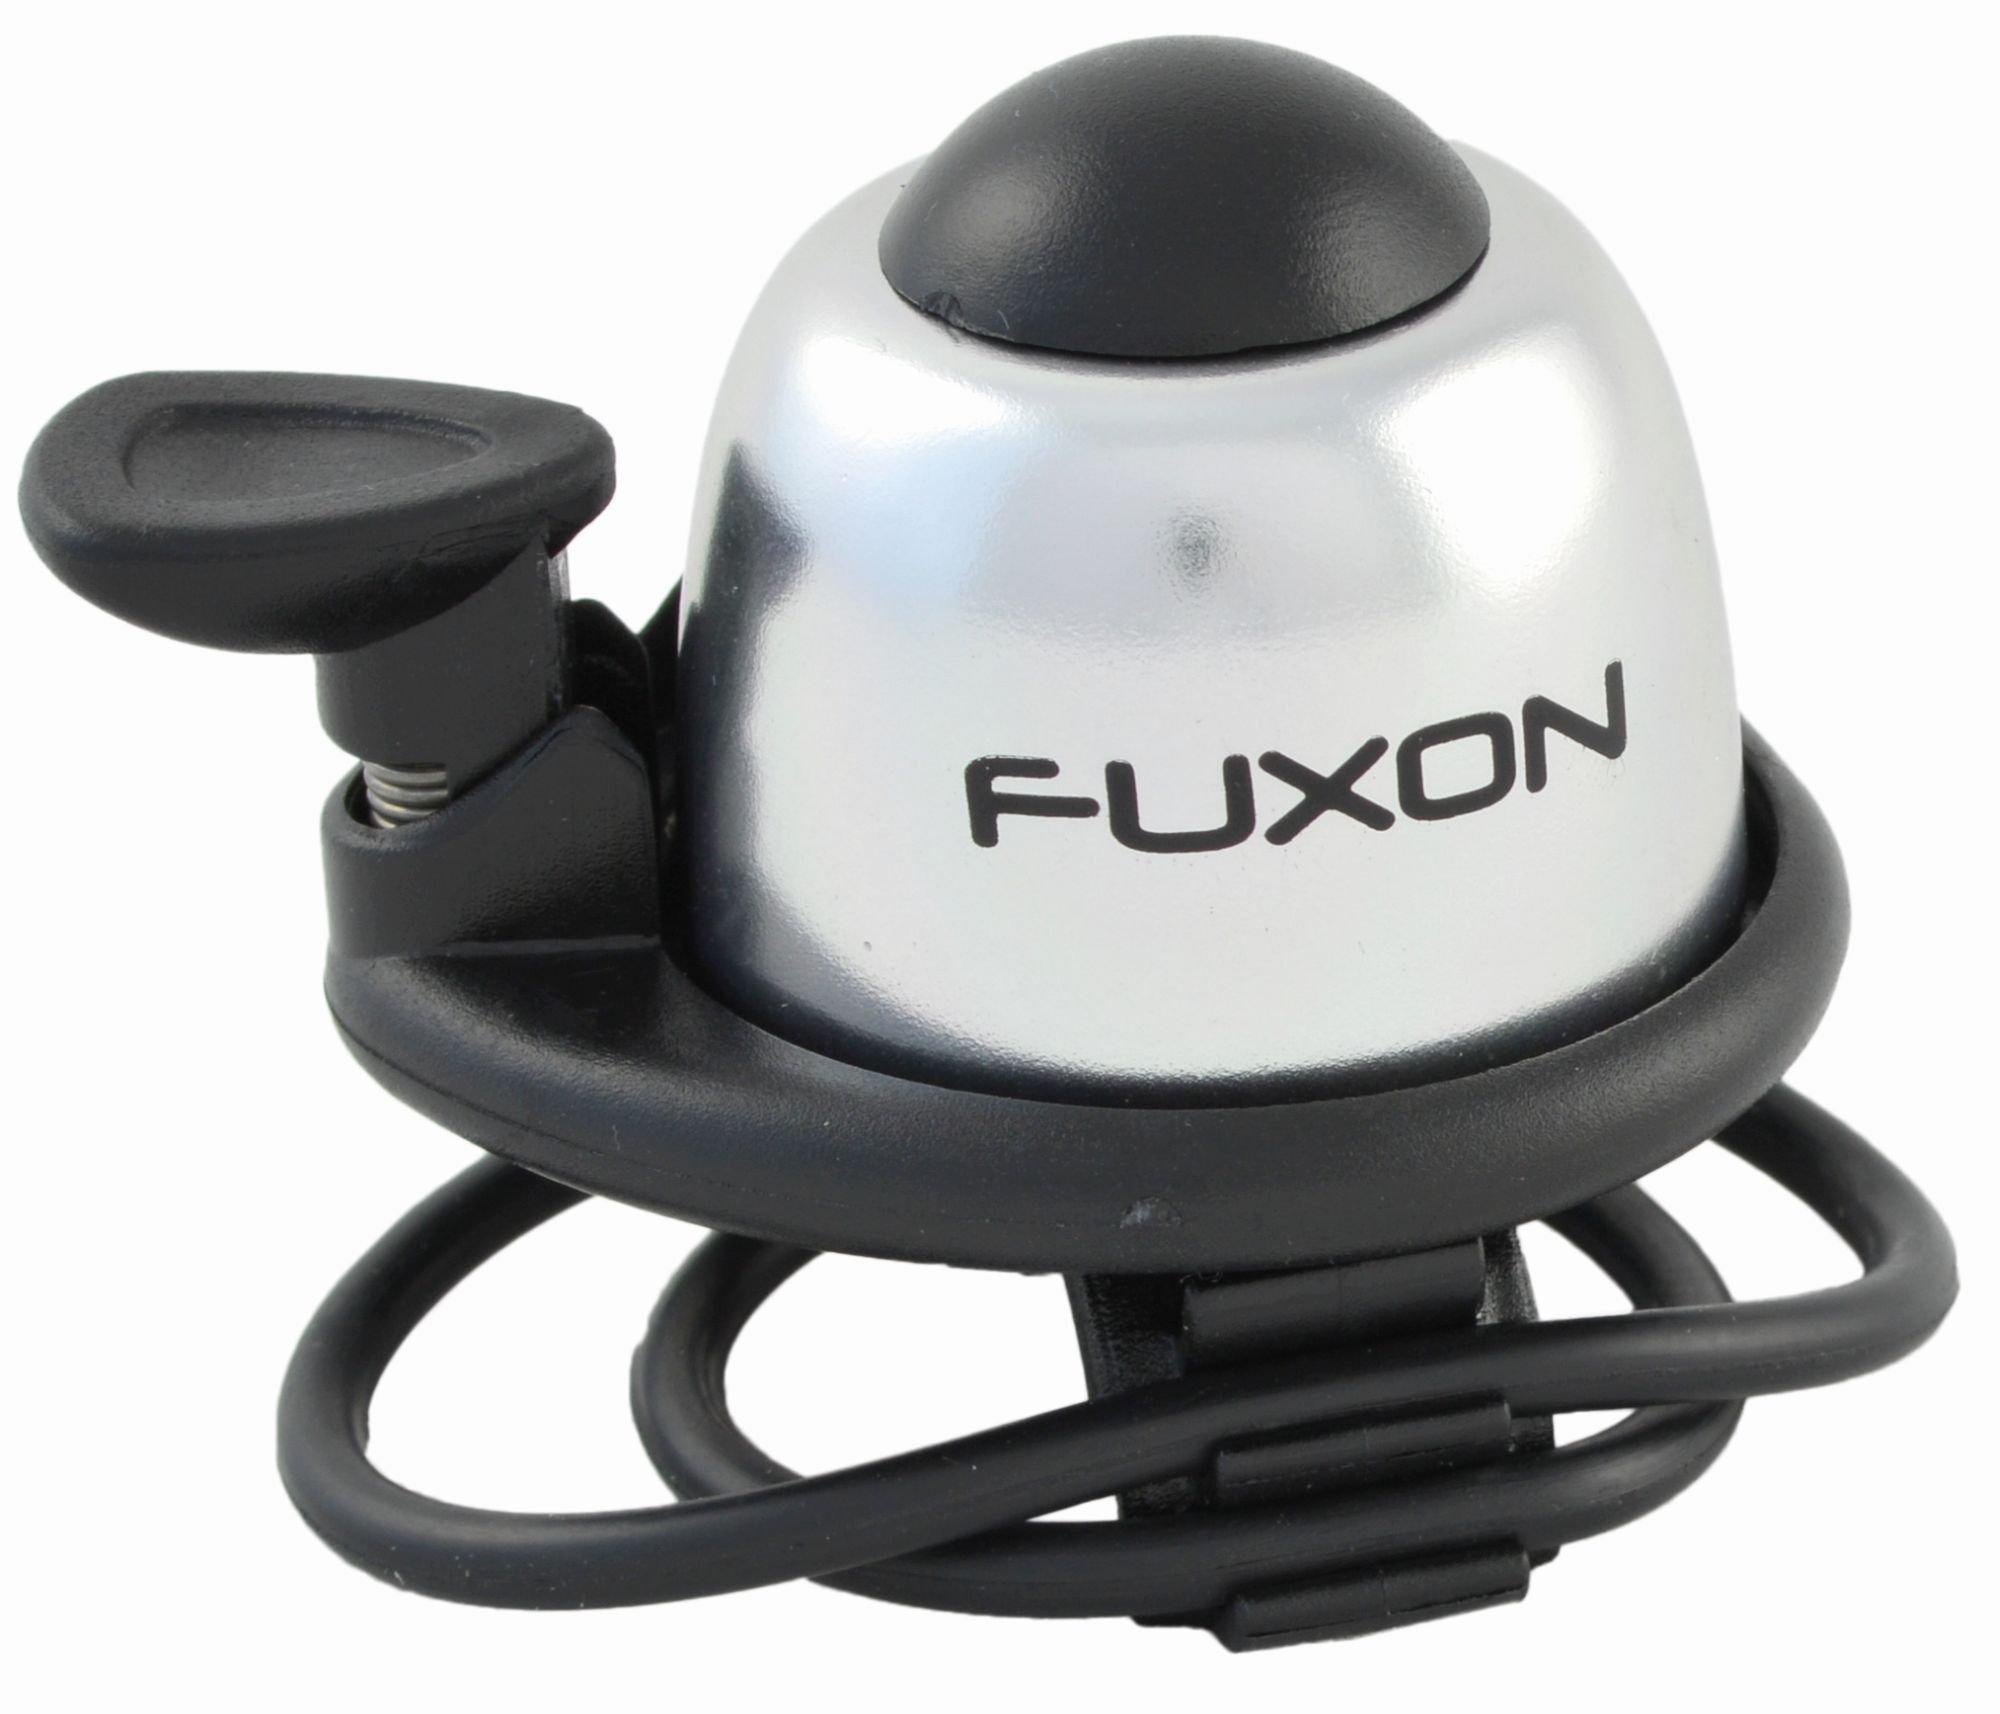 glocken & hupen/Klingeln & Hupen: Fuxon  Glocke Round ()